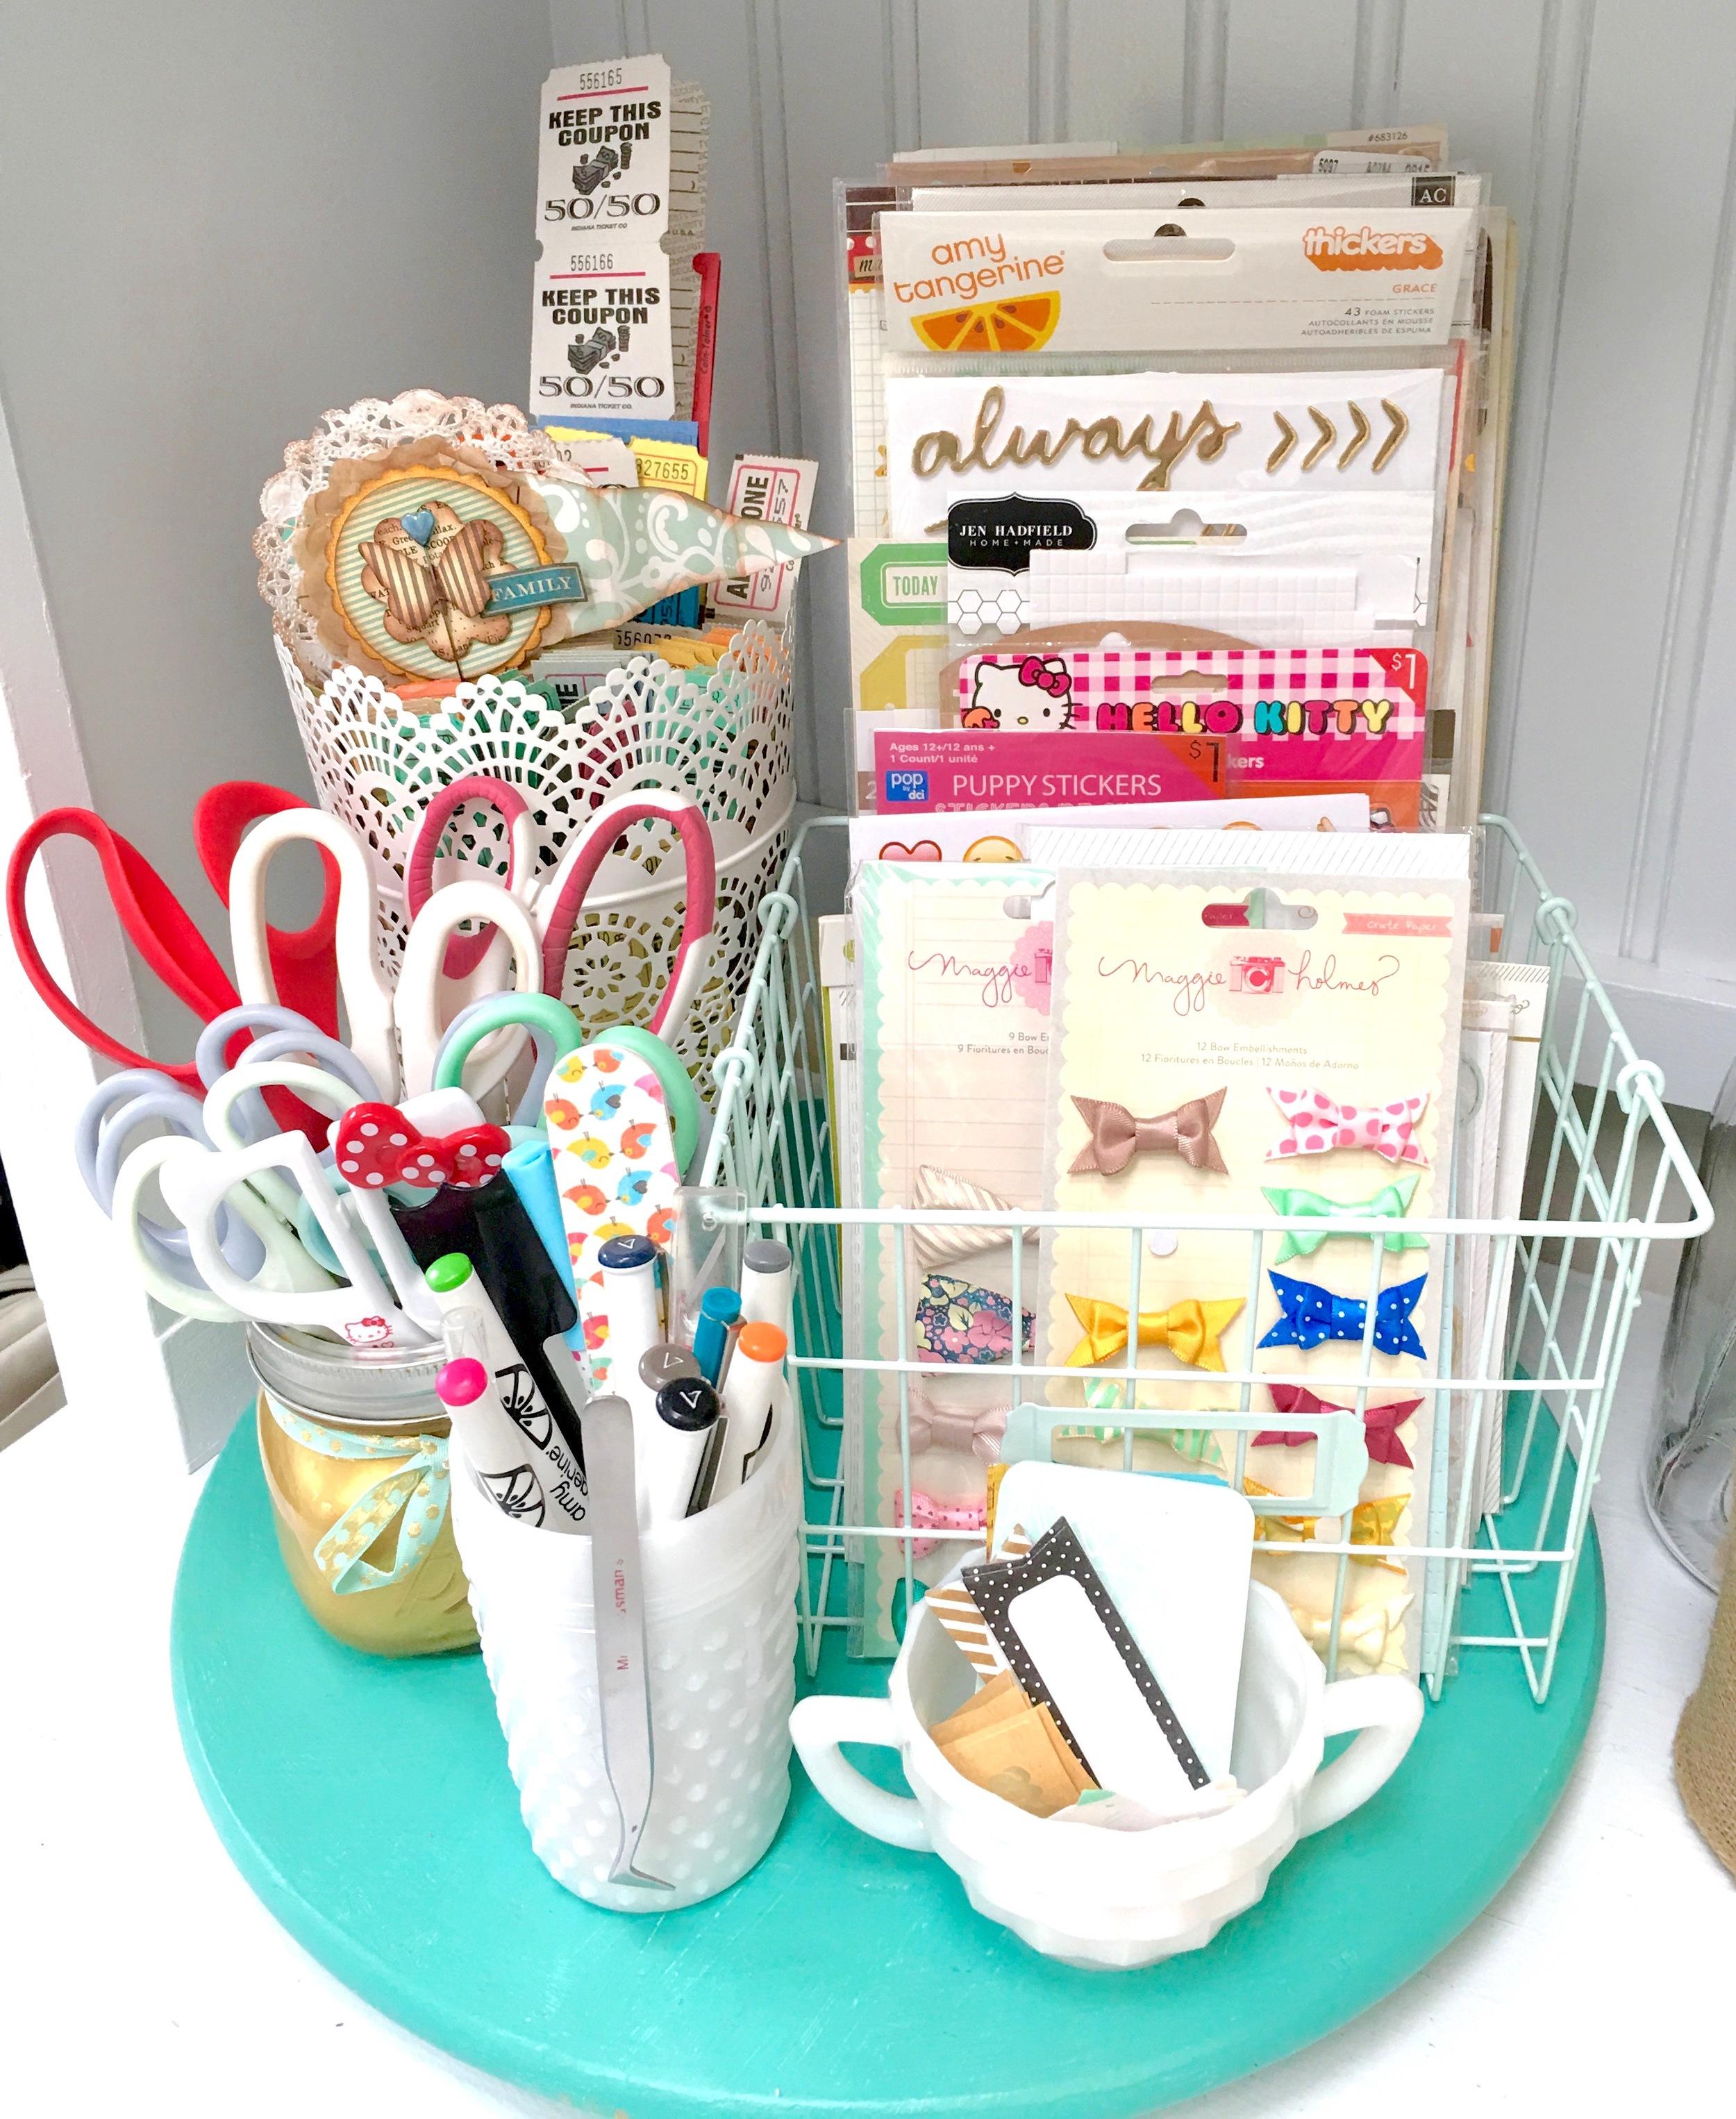 scrapbooking-scissors-embellishments-milk-glass-teal-a-peach-life.jpg